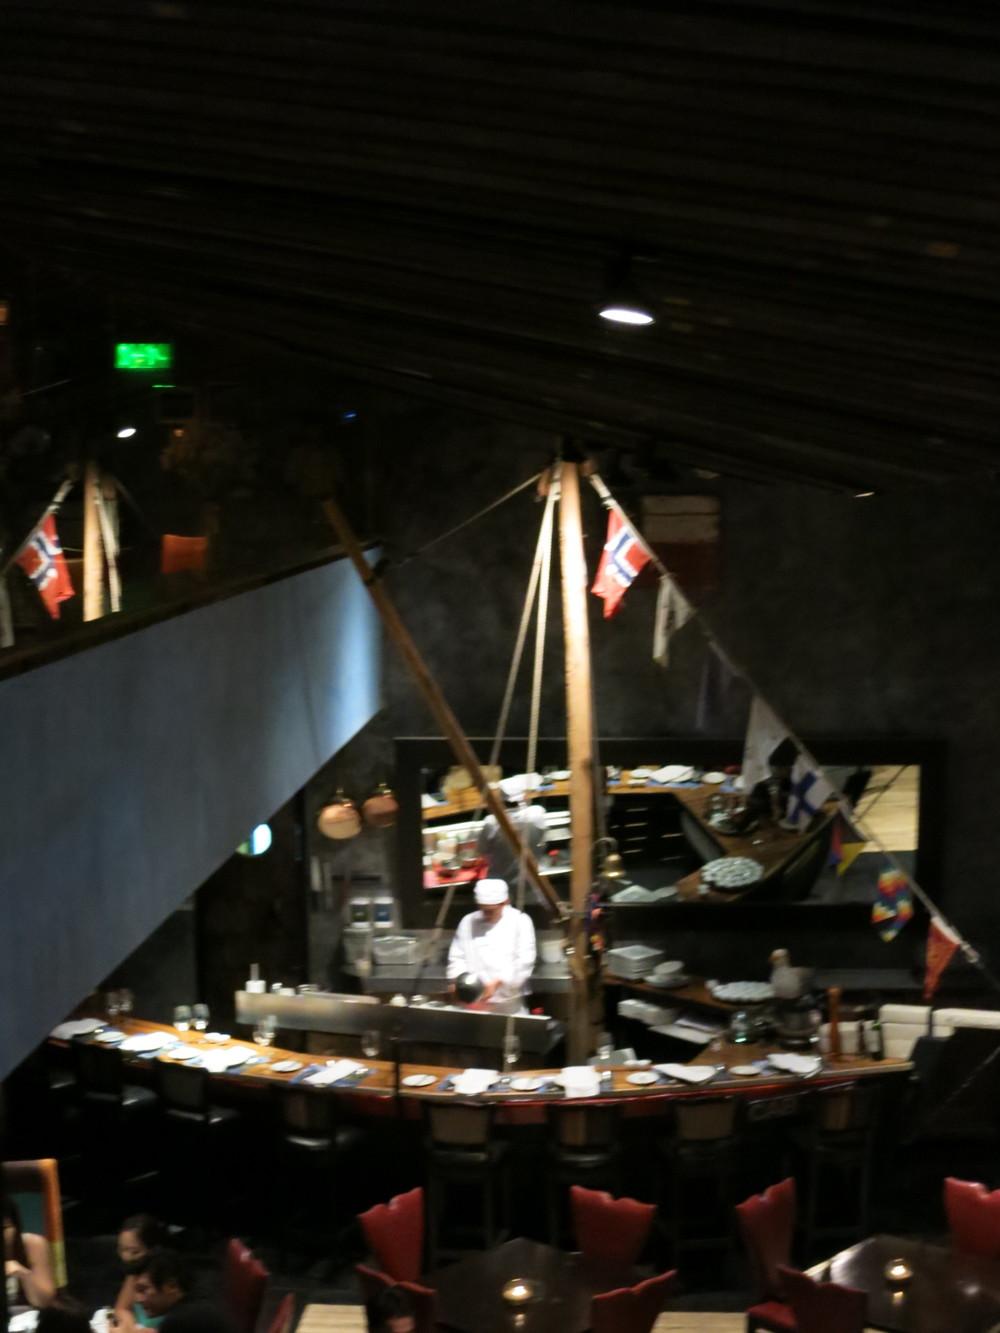 The bar was a ship!